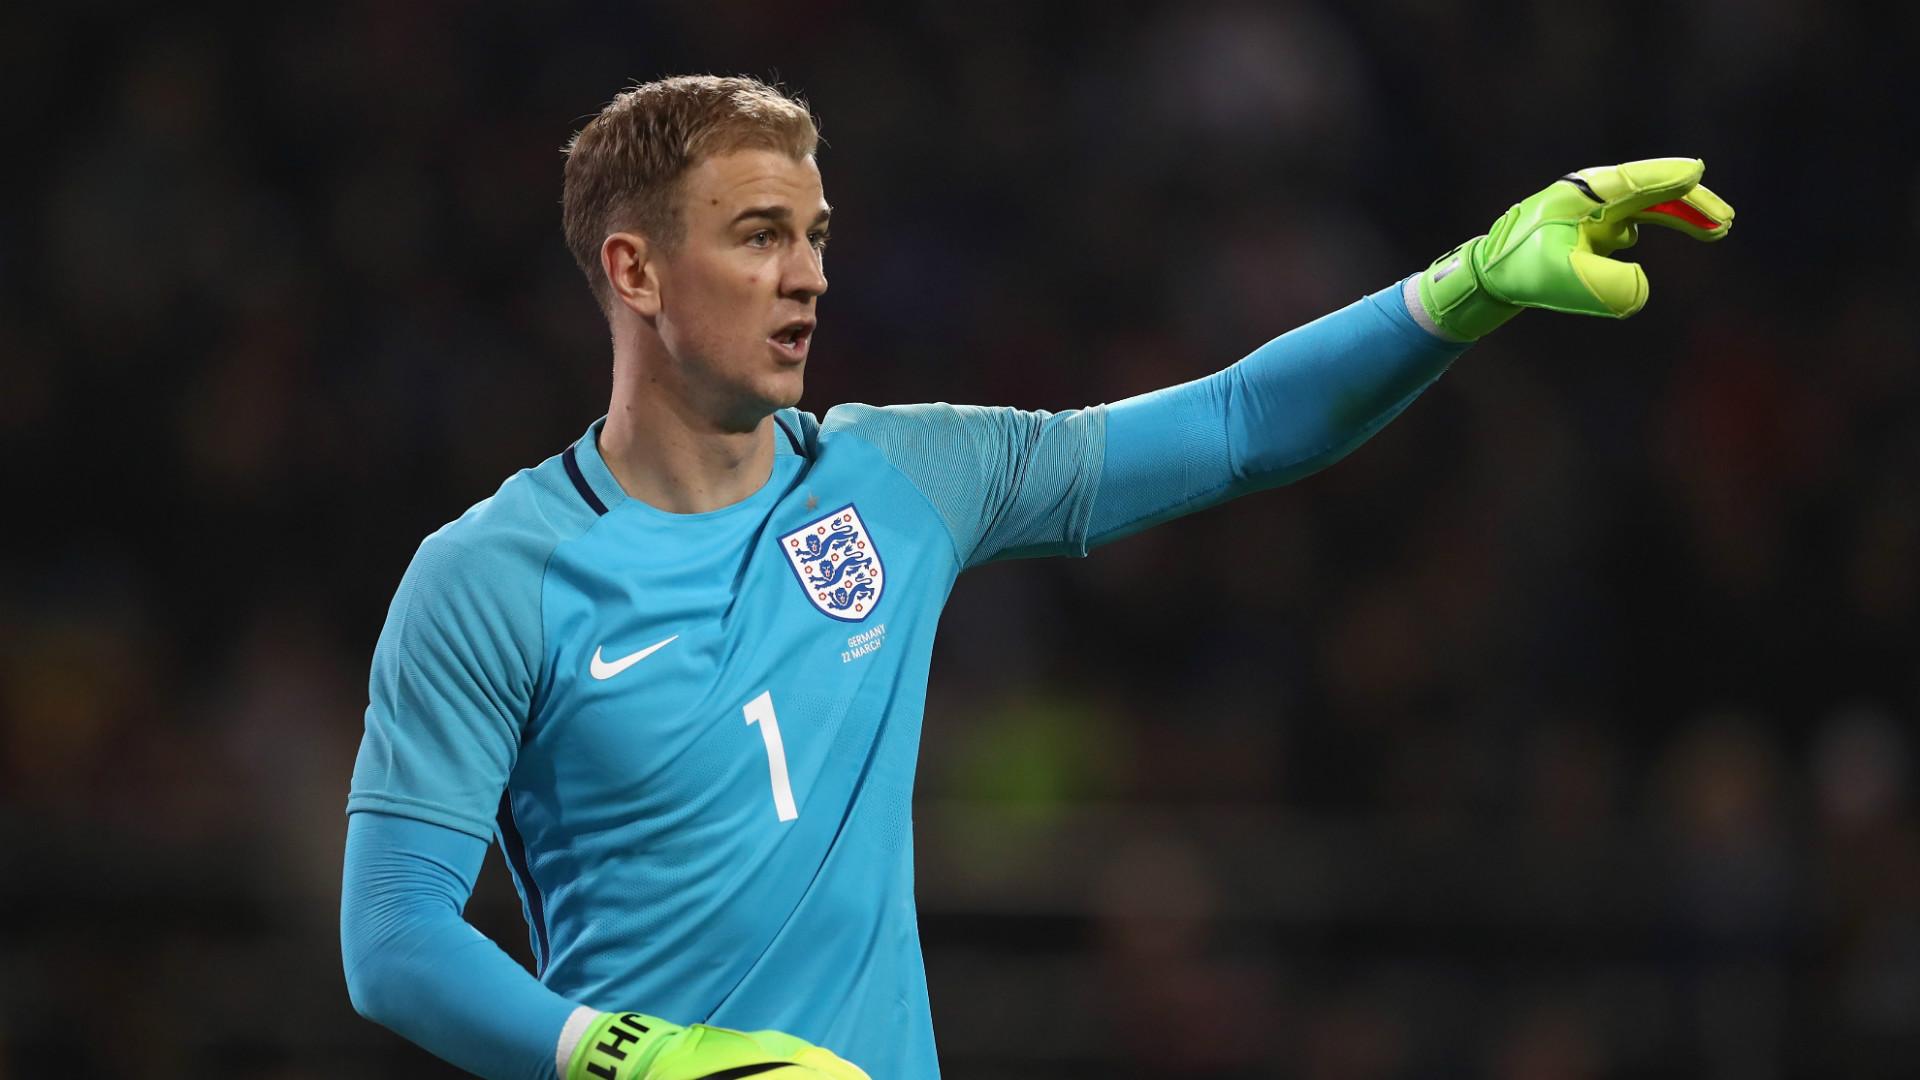 'Why isn't Joe Hart England's No.1?' – Man Utd legend Schmeichel picks holes in goalkeeping crop